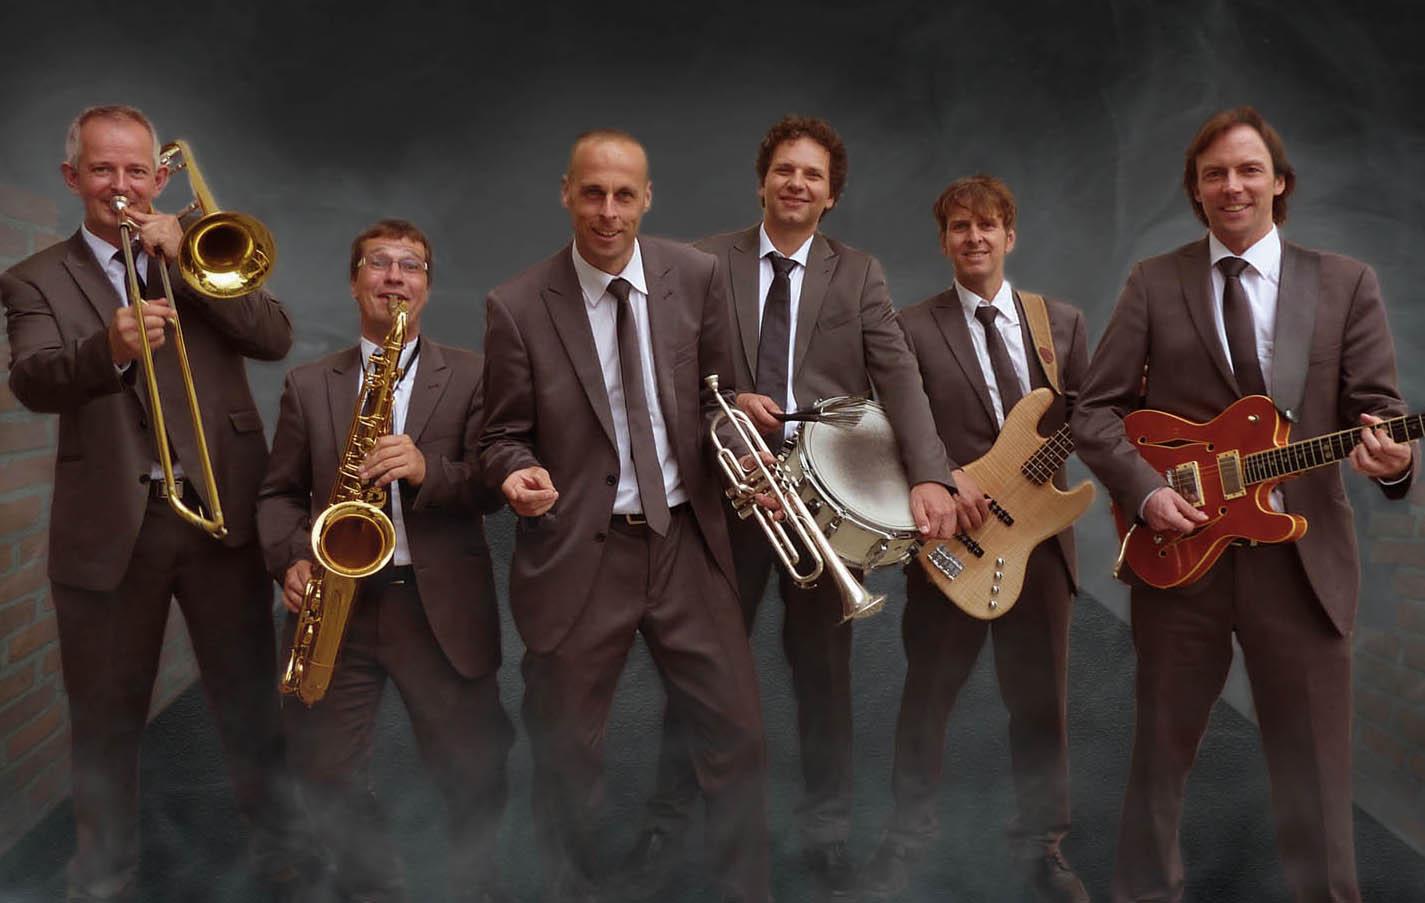 Hochzeitsband Koln Partyband Tom Browne Band